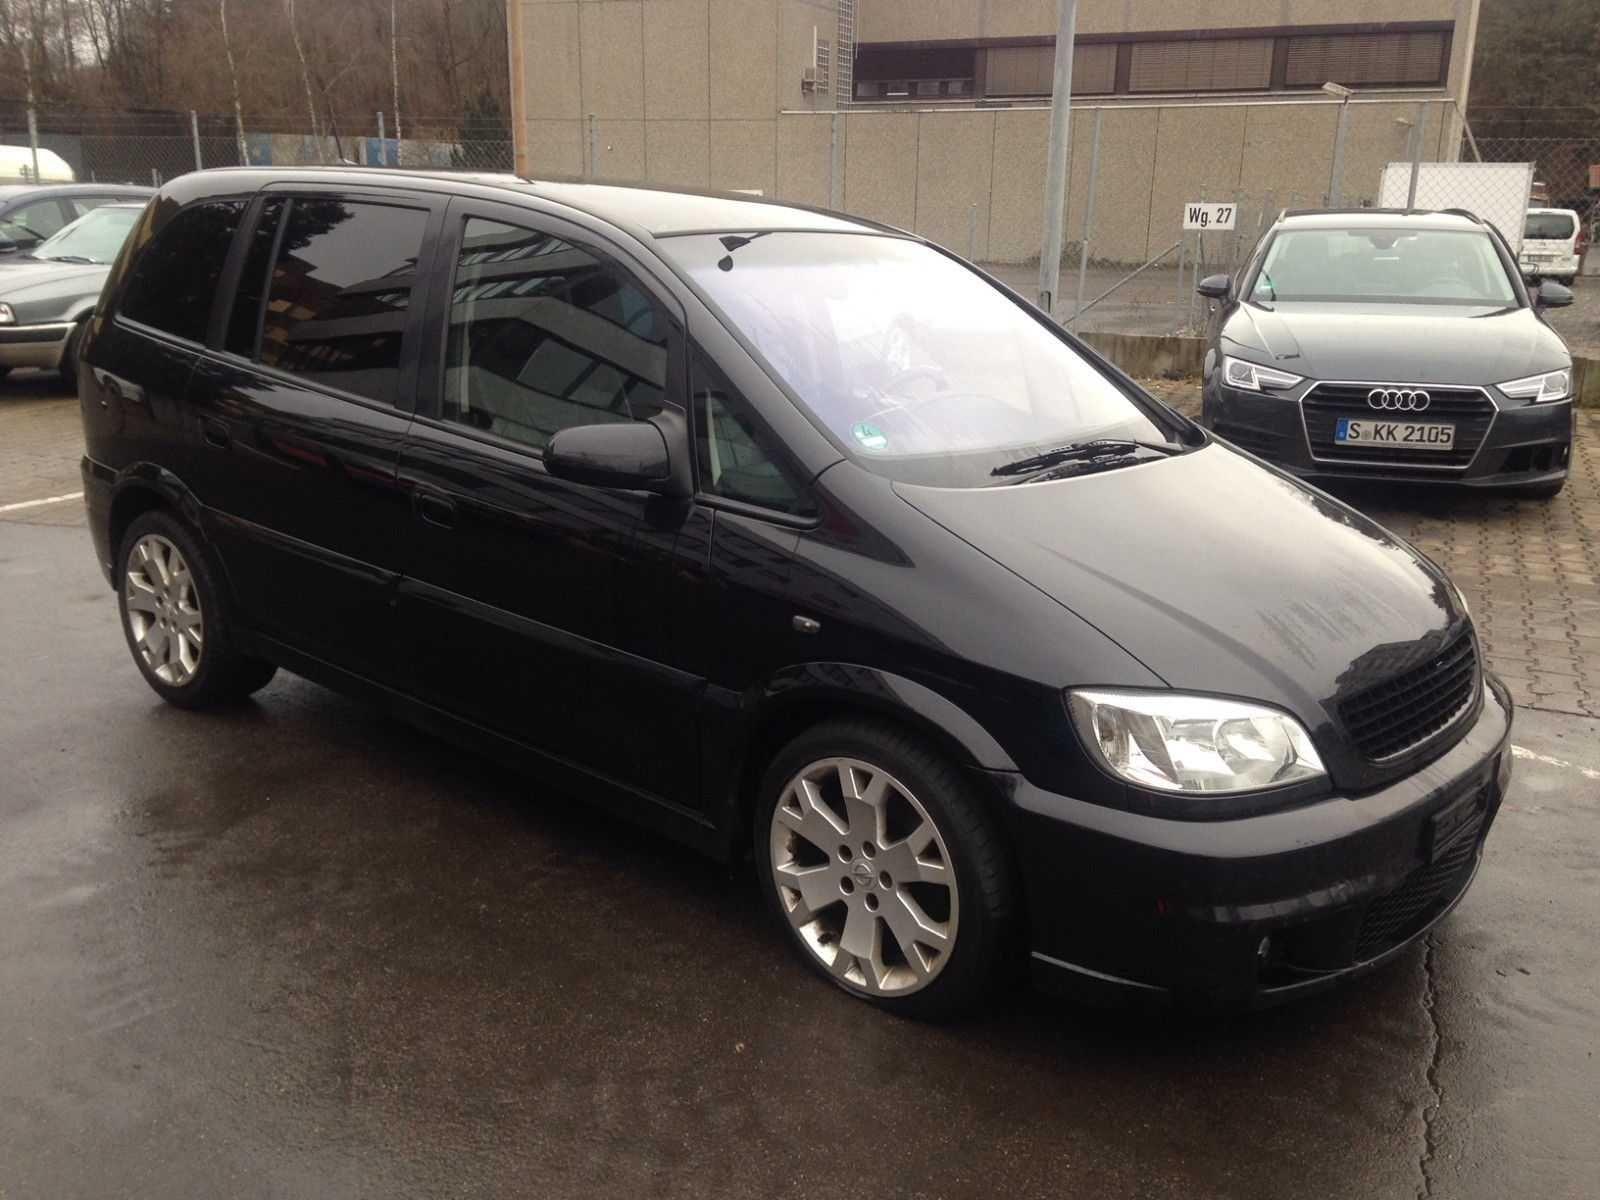 Ebay De Mobiles Gunstiger Opel Zafira A 2 0 16v Opc Turbo